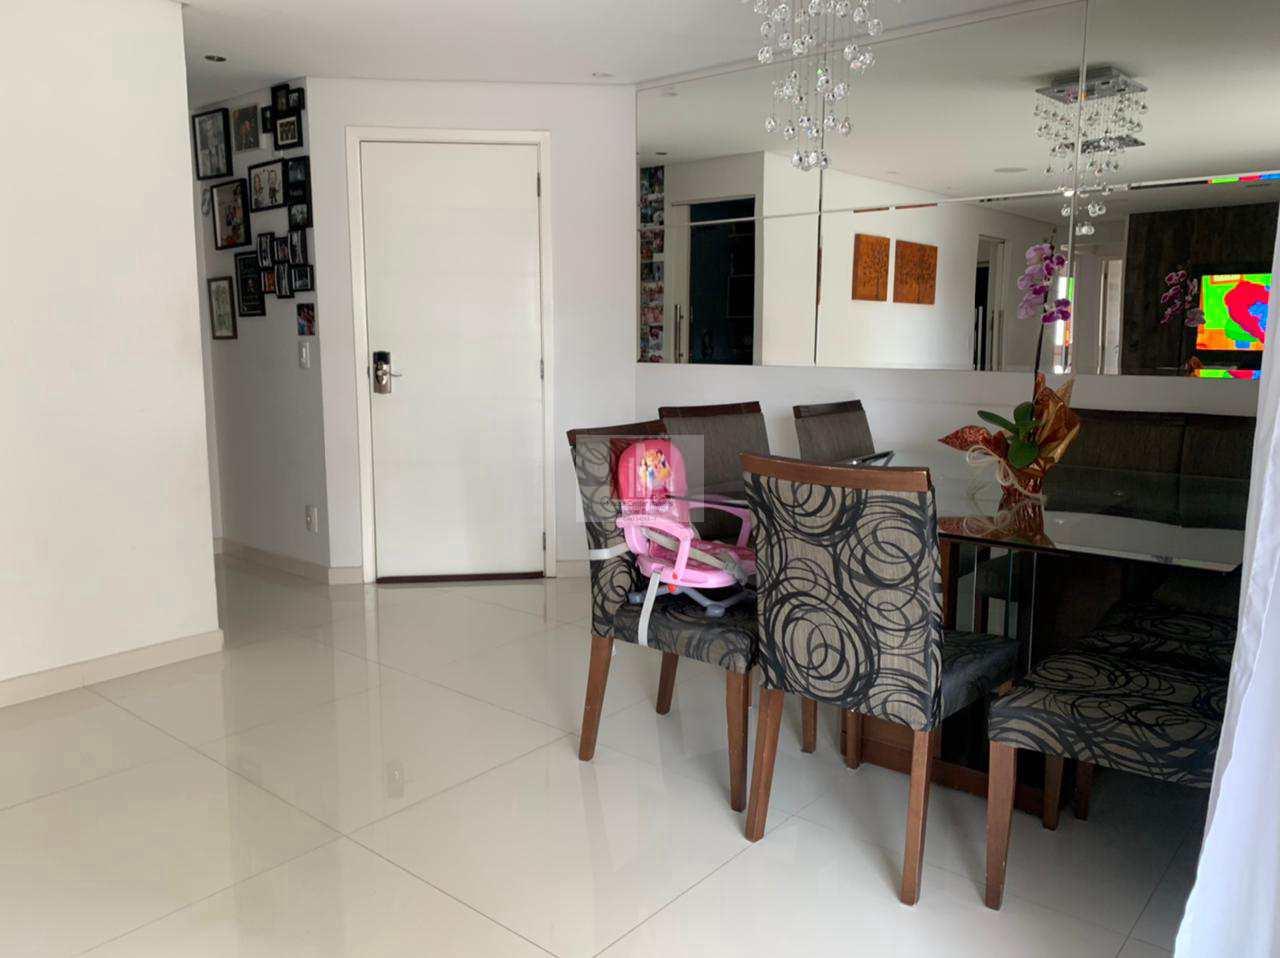 Apartamento com 3 dorms, Vila Prudente, São Paulo - R$ 1.03 mi, Cod: 1209